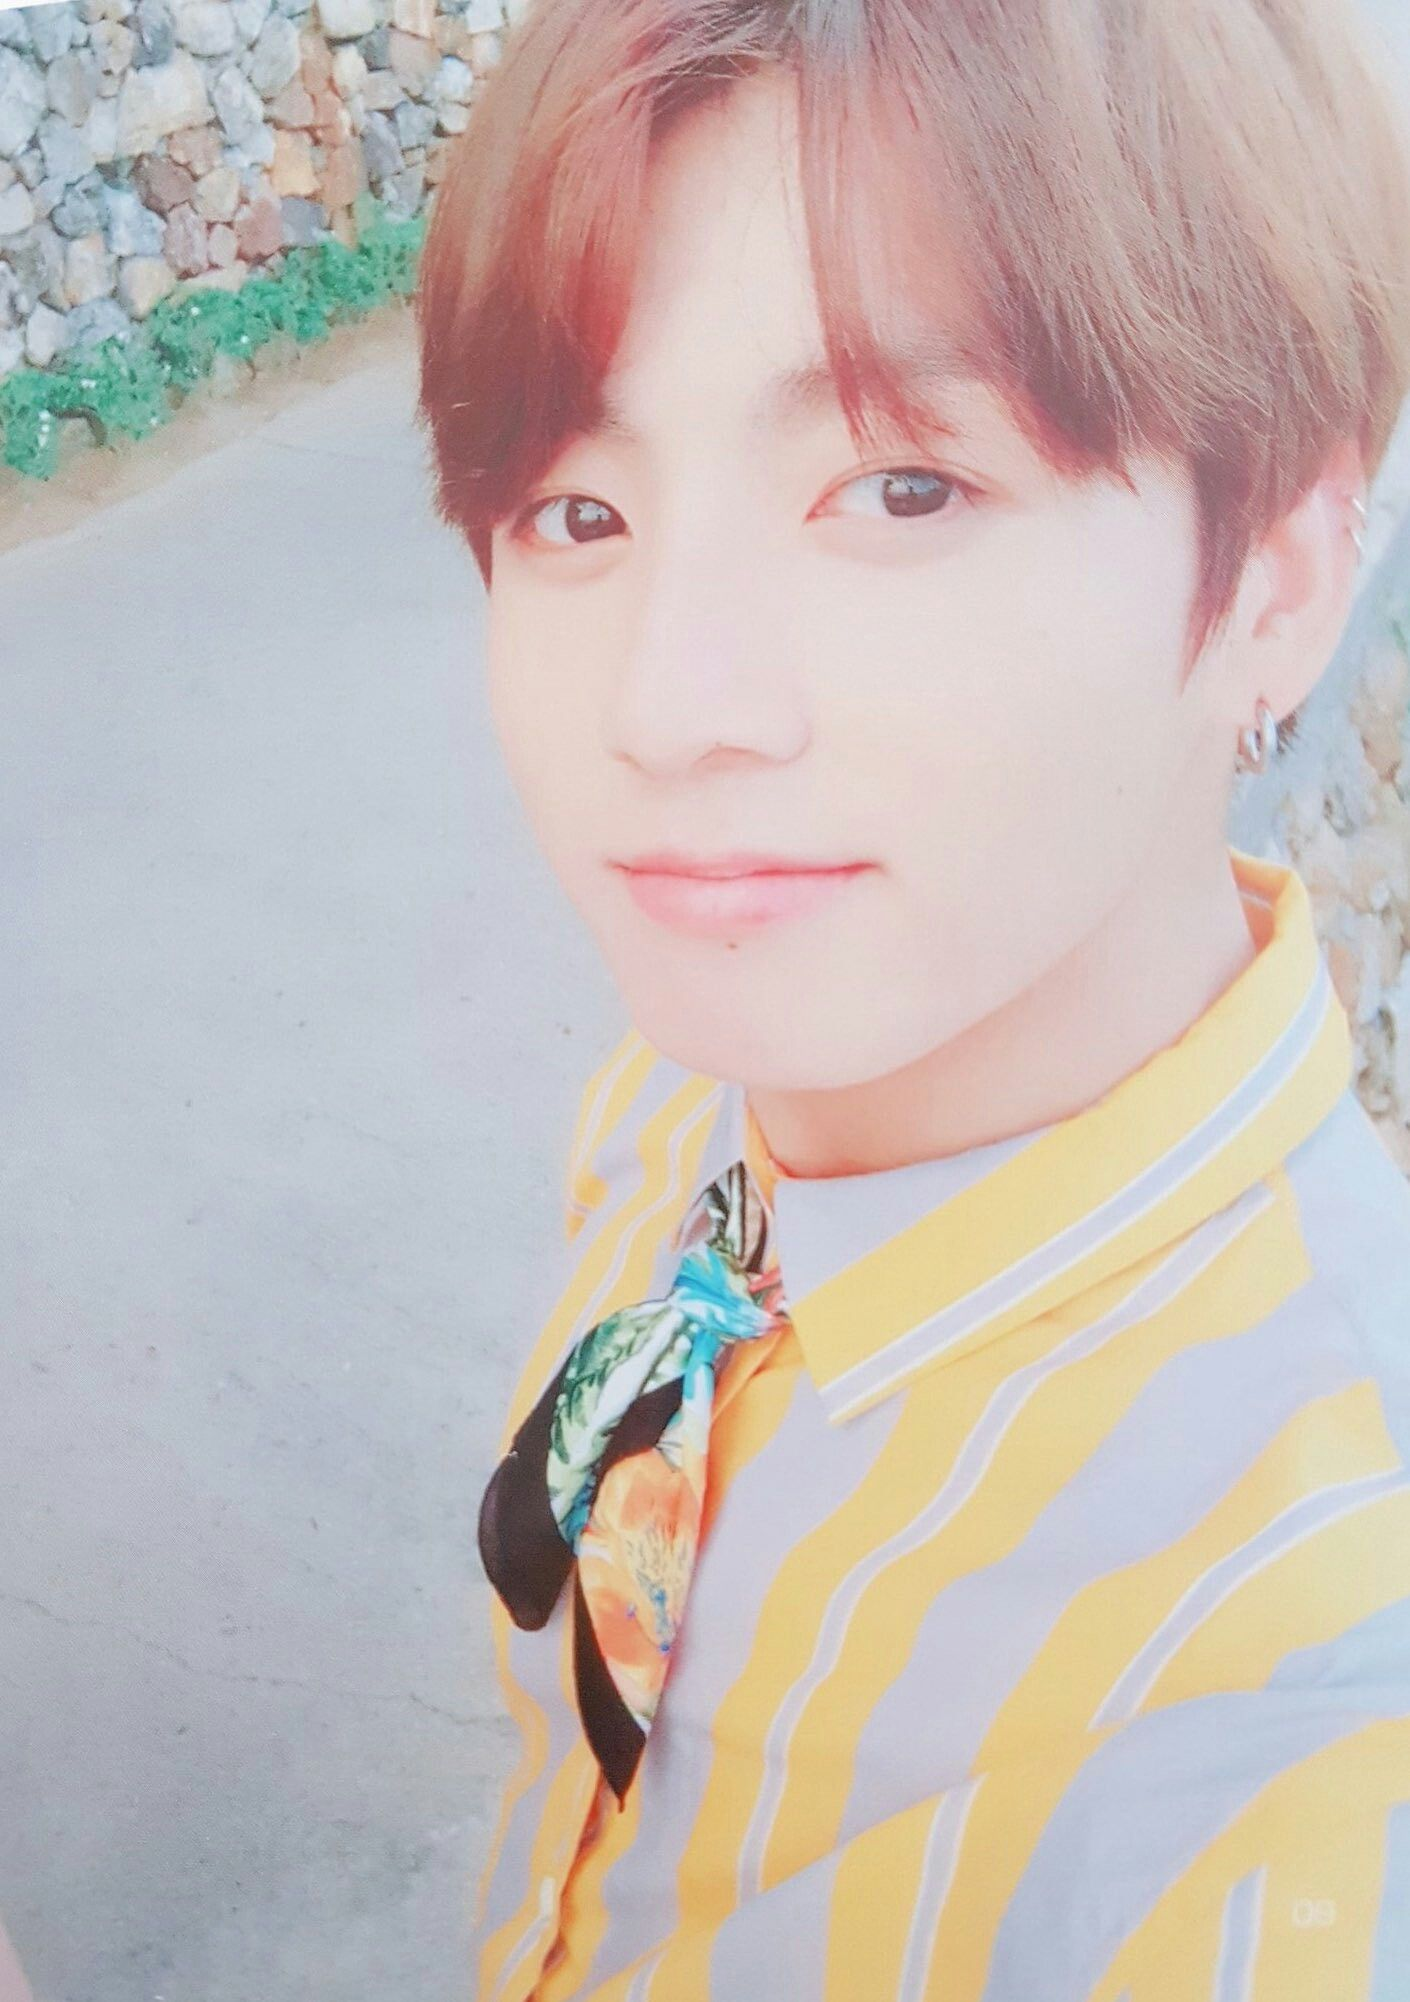 Hairstyle of boy sugamon  jungkook  pinterest  bts